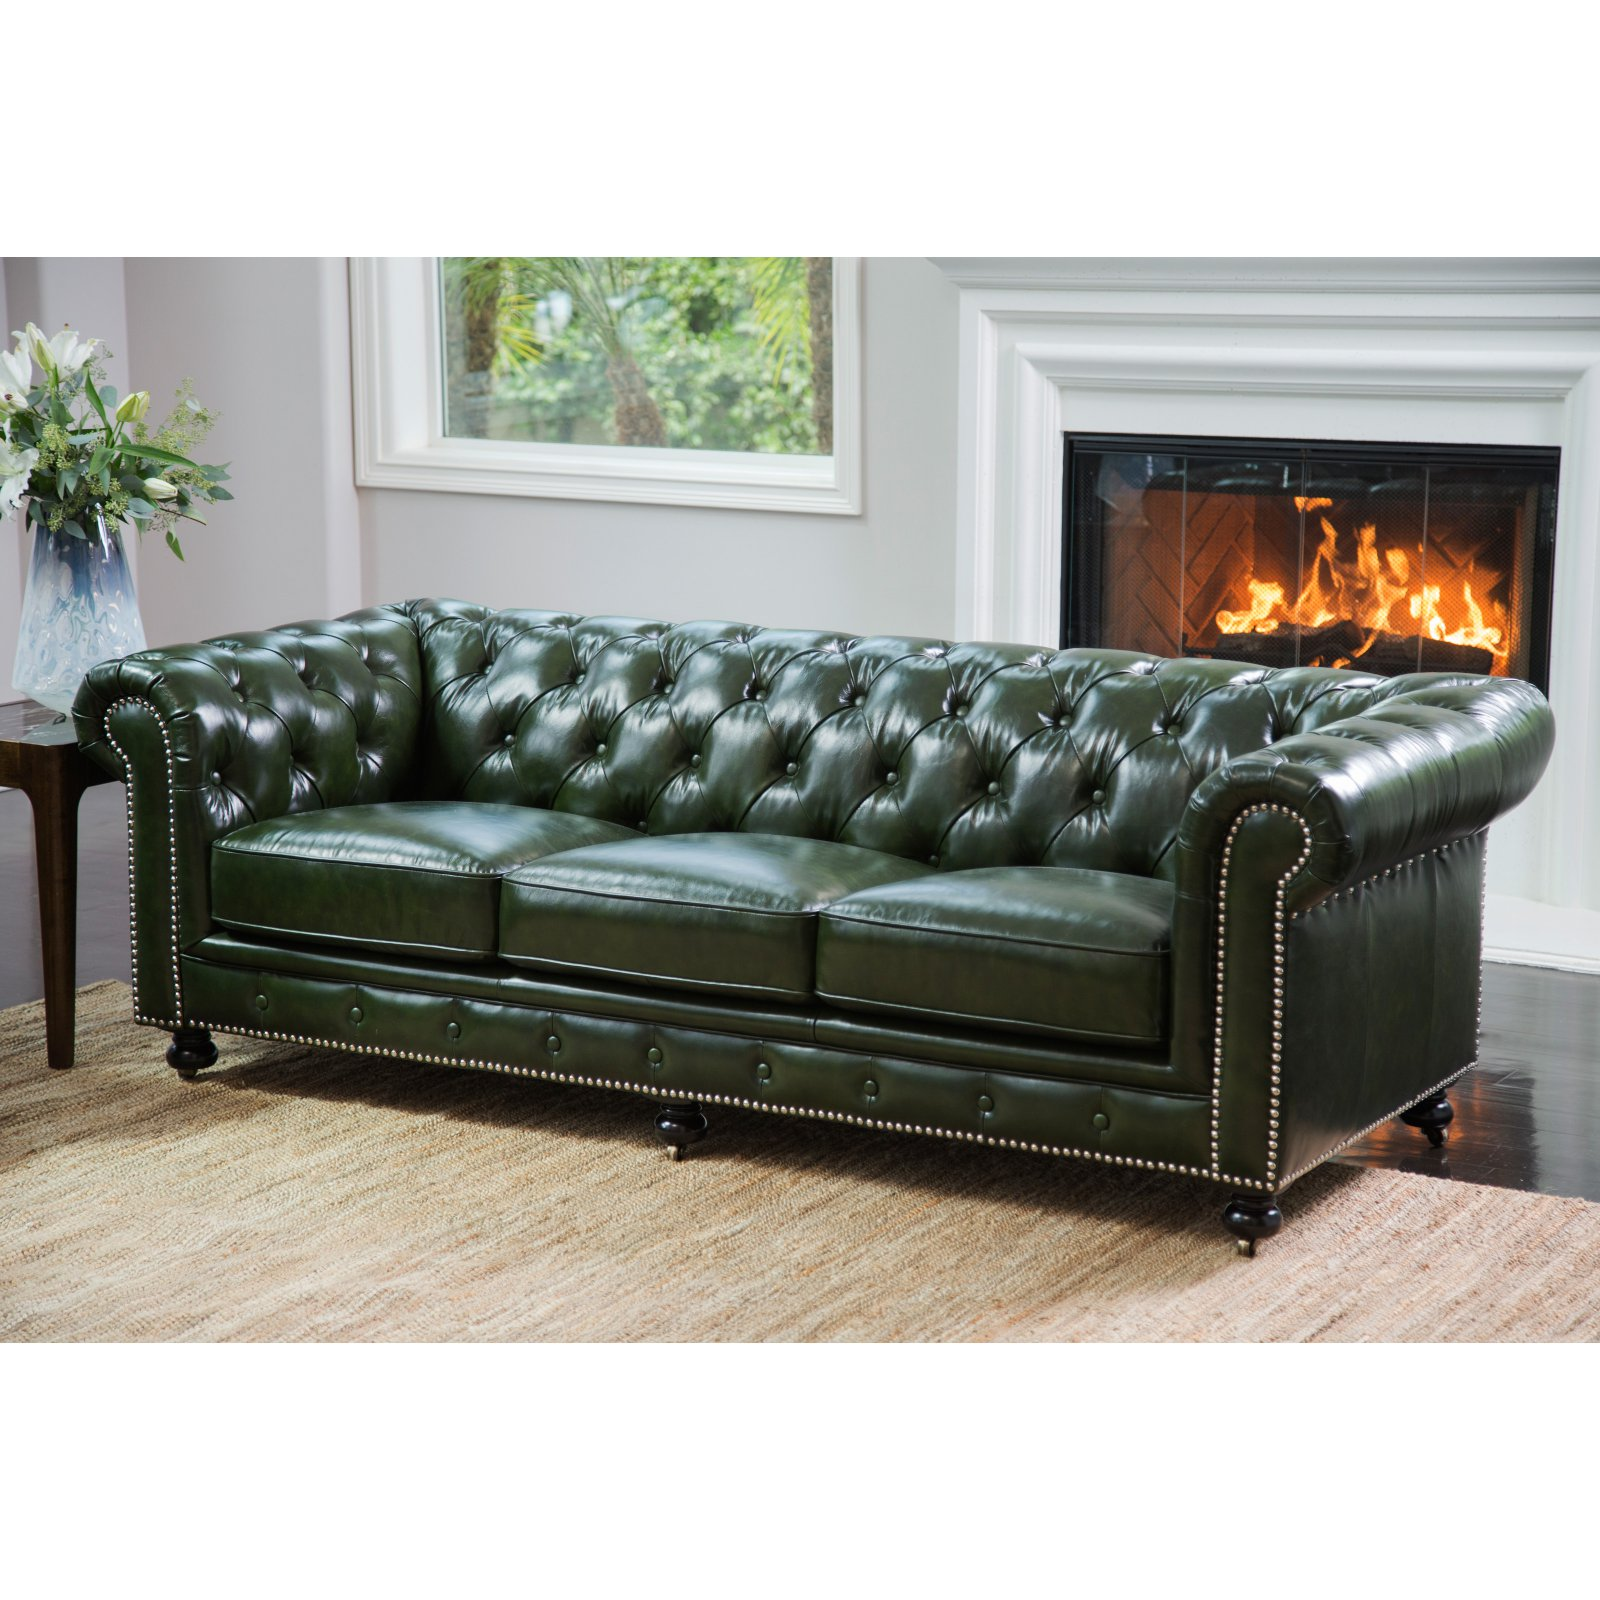 abbyson leather sofa pull down sleeper xavier top grain waxed chesterfield